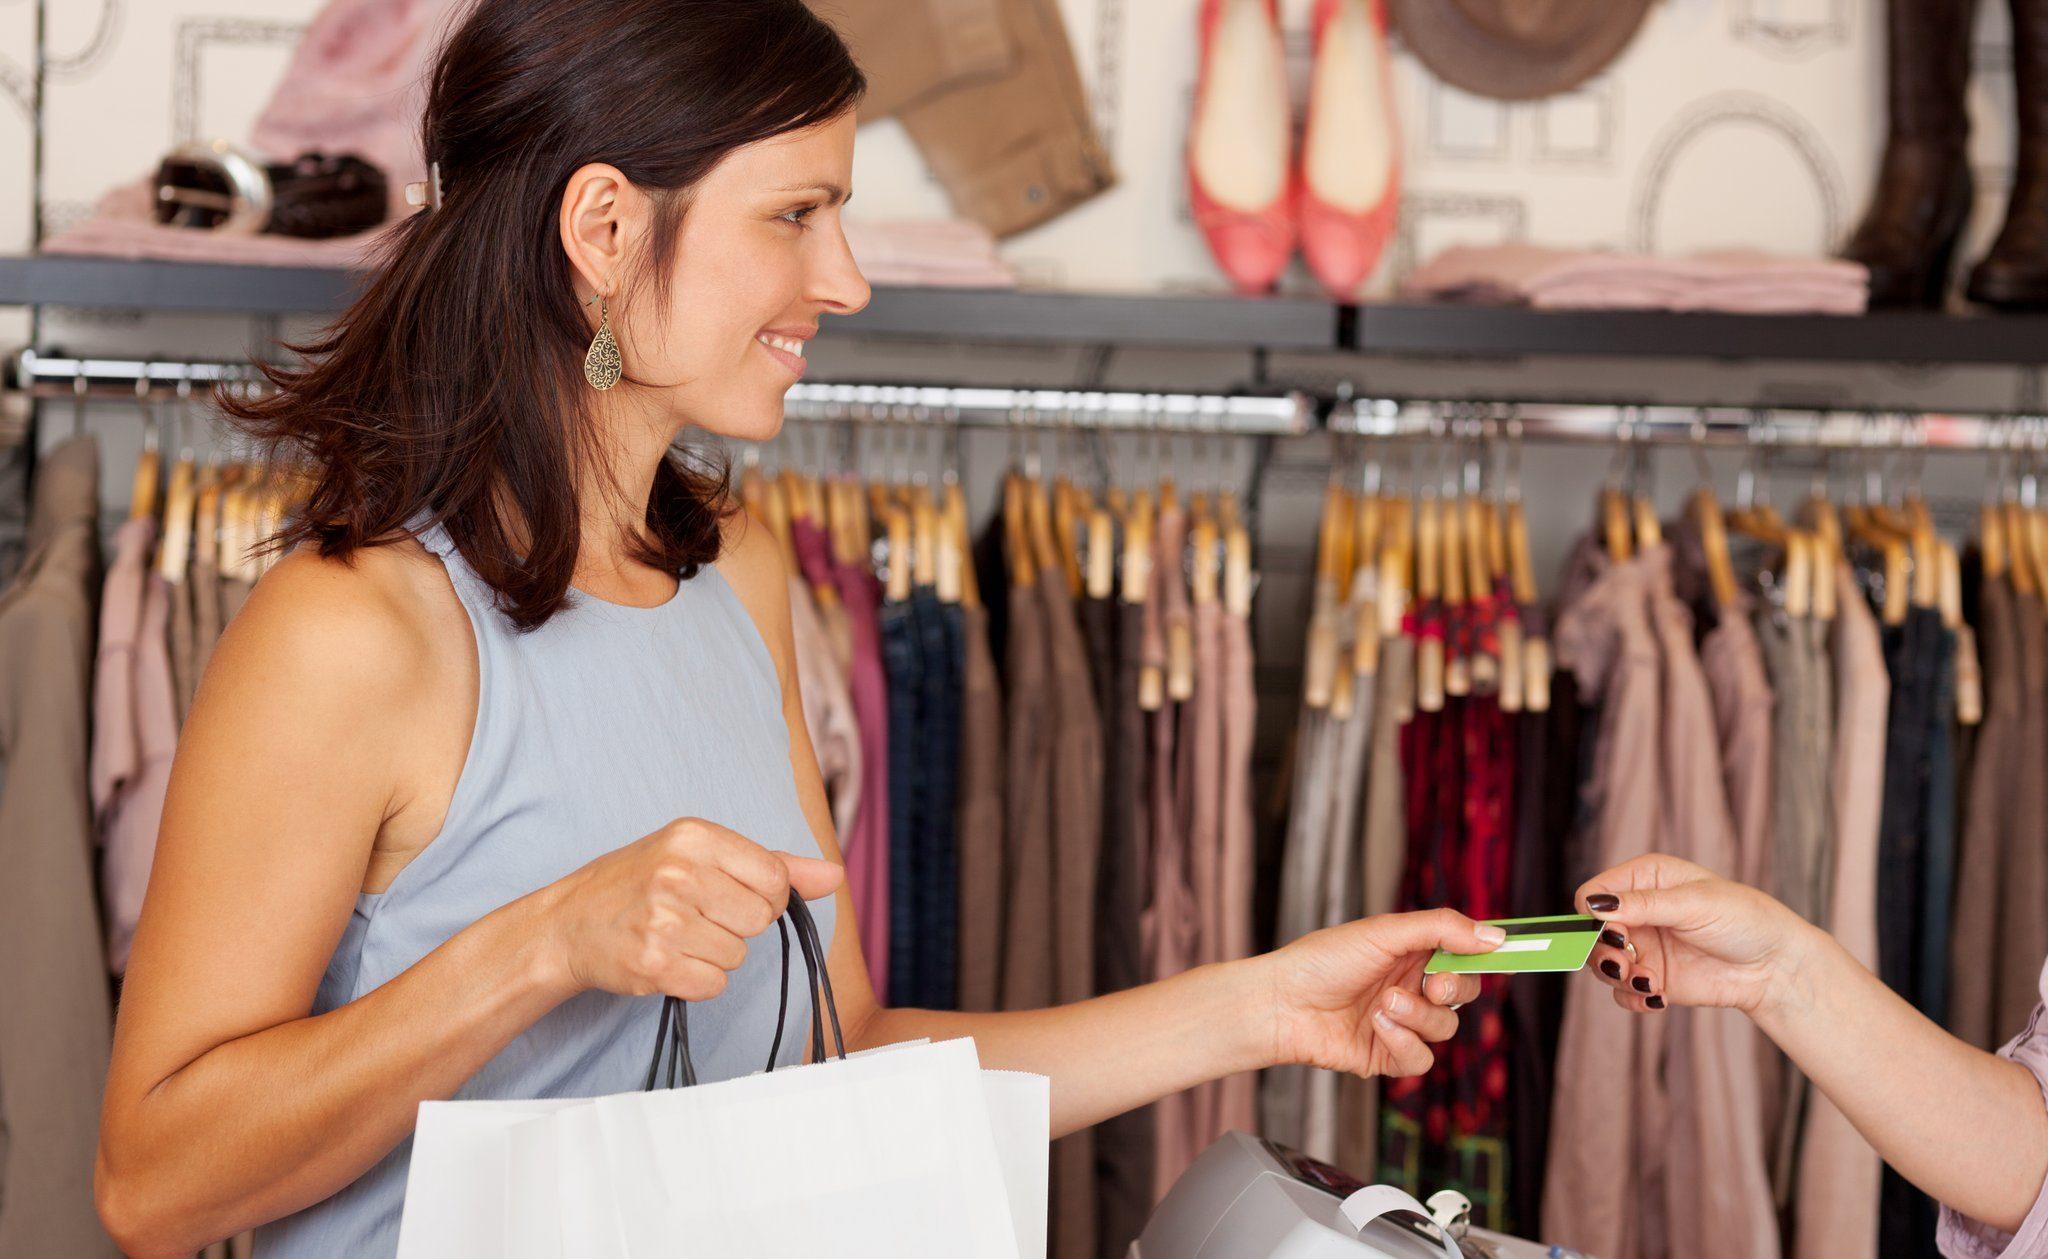 retailstekker veilige snelle pinverbinding en winkelautomatisering